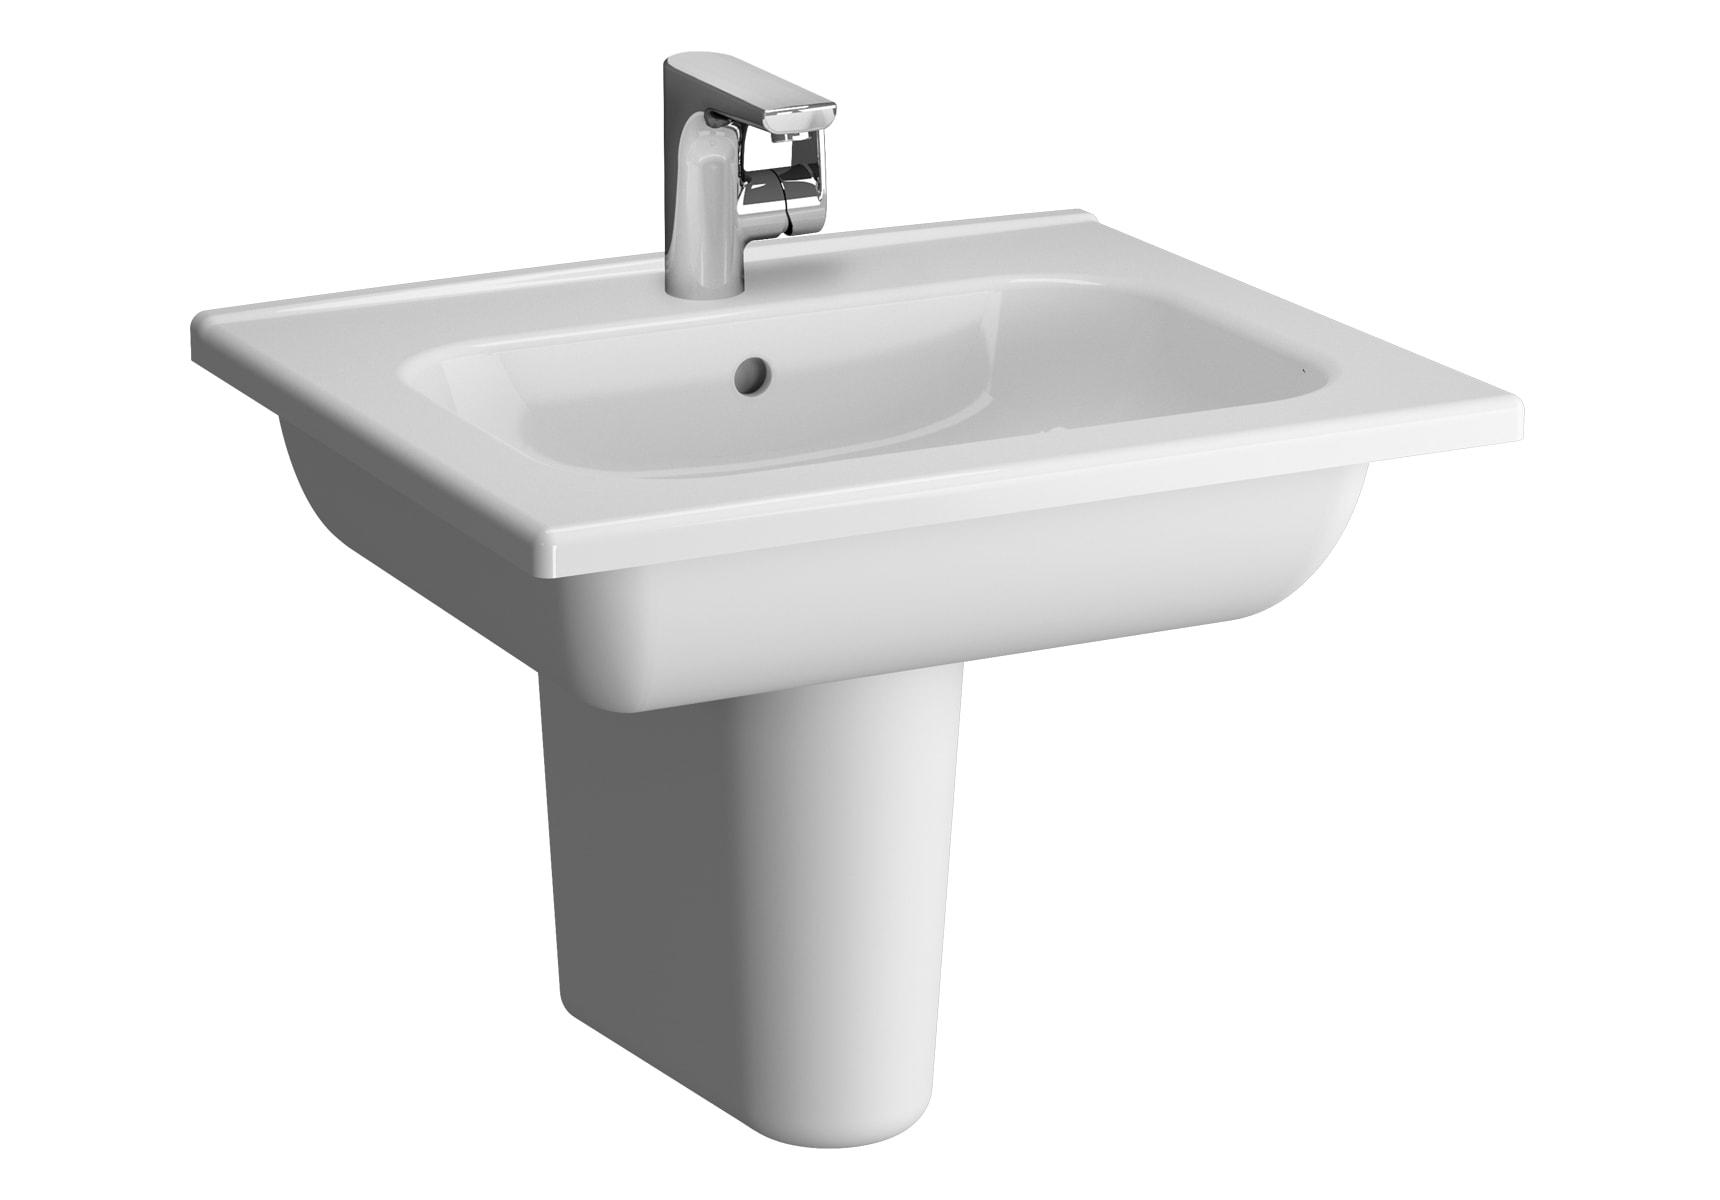 D-Light Vanity Basin, 60cm